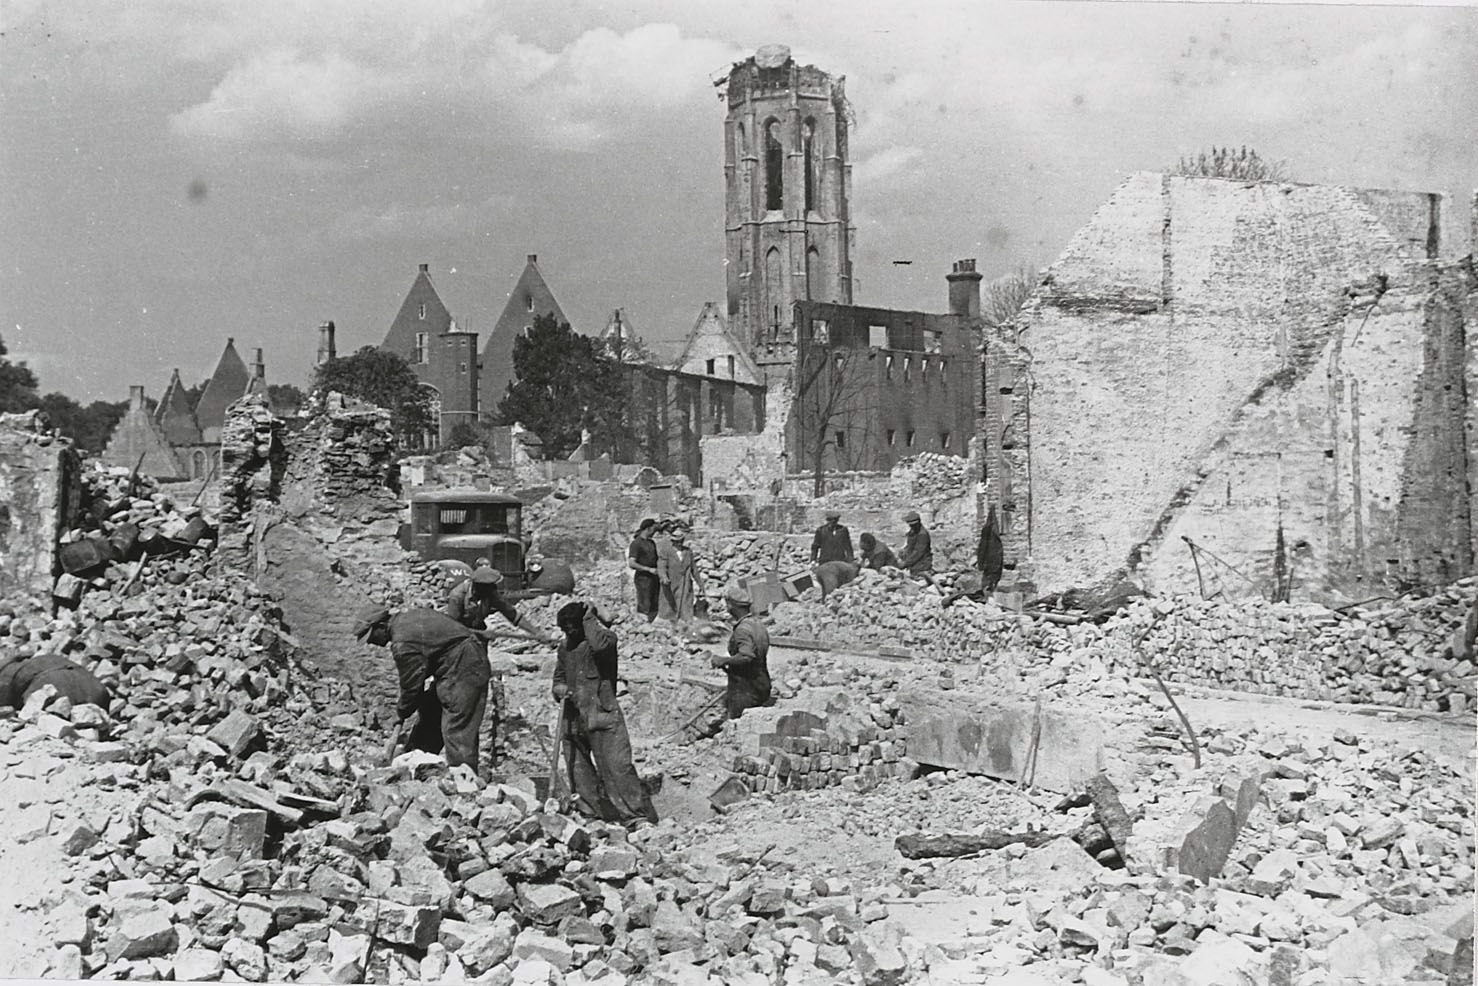 Middelburg na de brand in mei 1940. (Zeeuws Archief, HTAM)